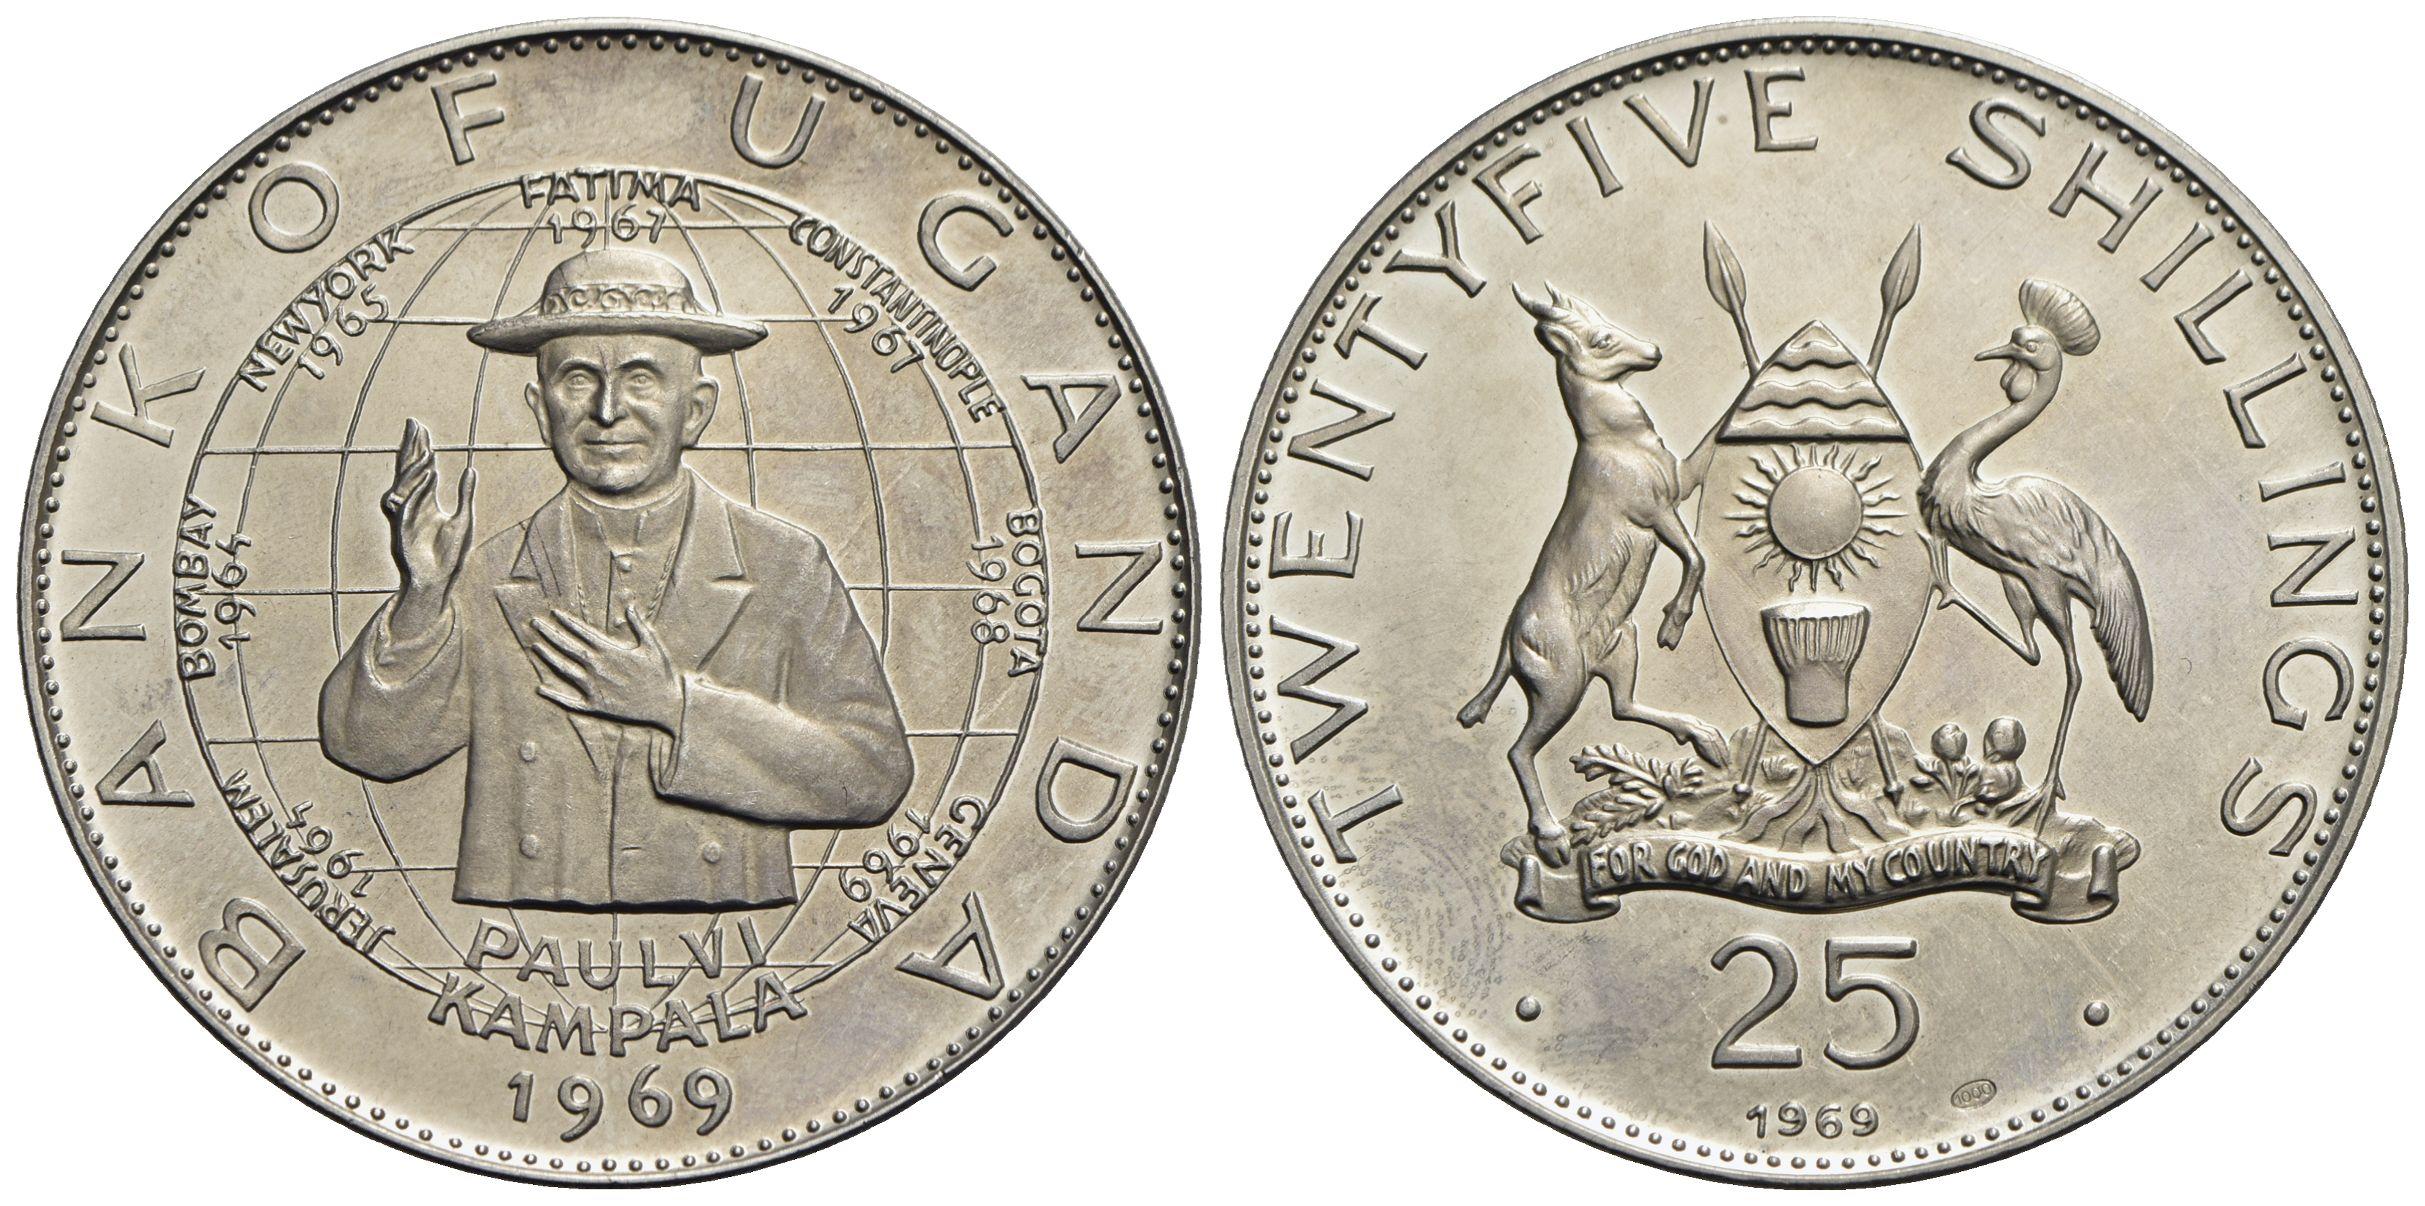 KM27 Uganda 1987 1 Shilling 10 Uncirculated Coin Lot